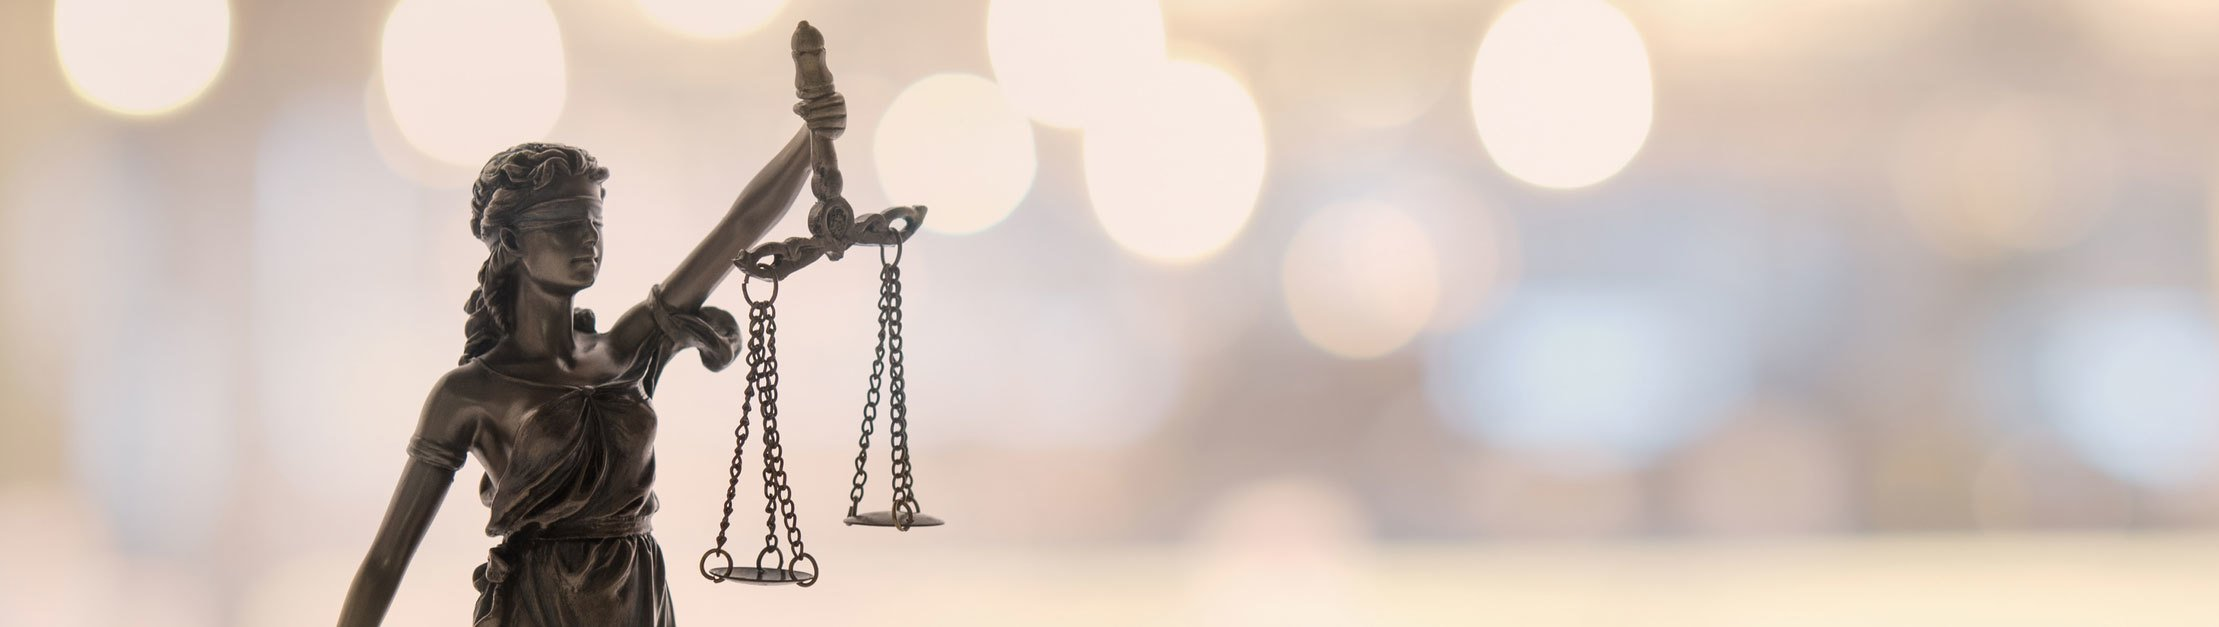 B/S/P - Behr Sohn & Partner Steuerberater & Rechtsanwälte